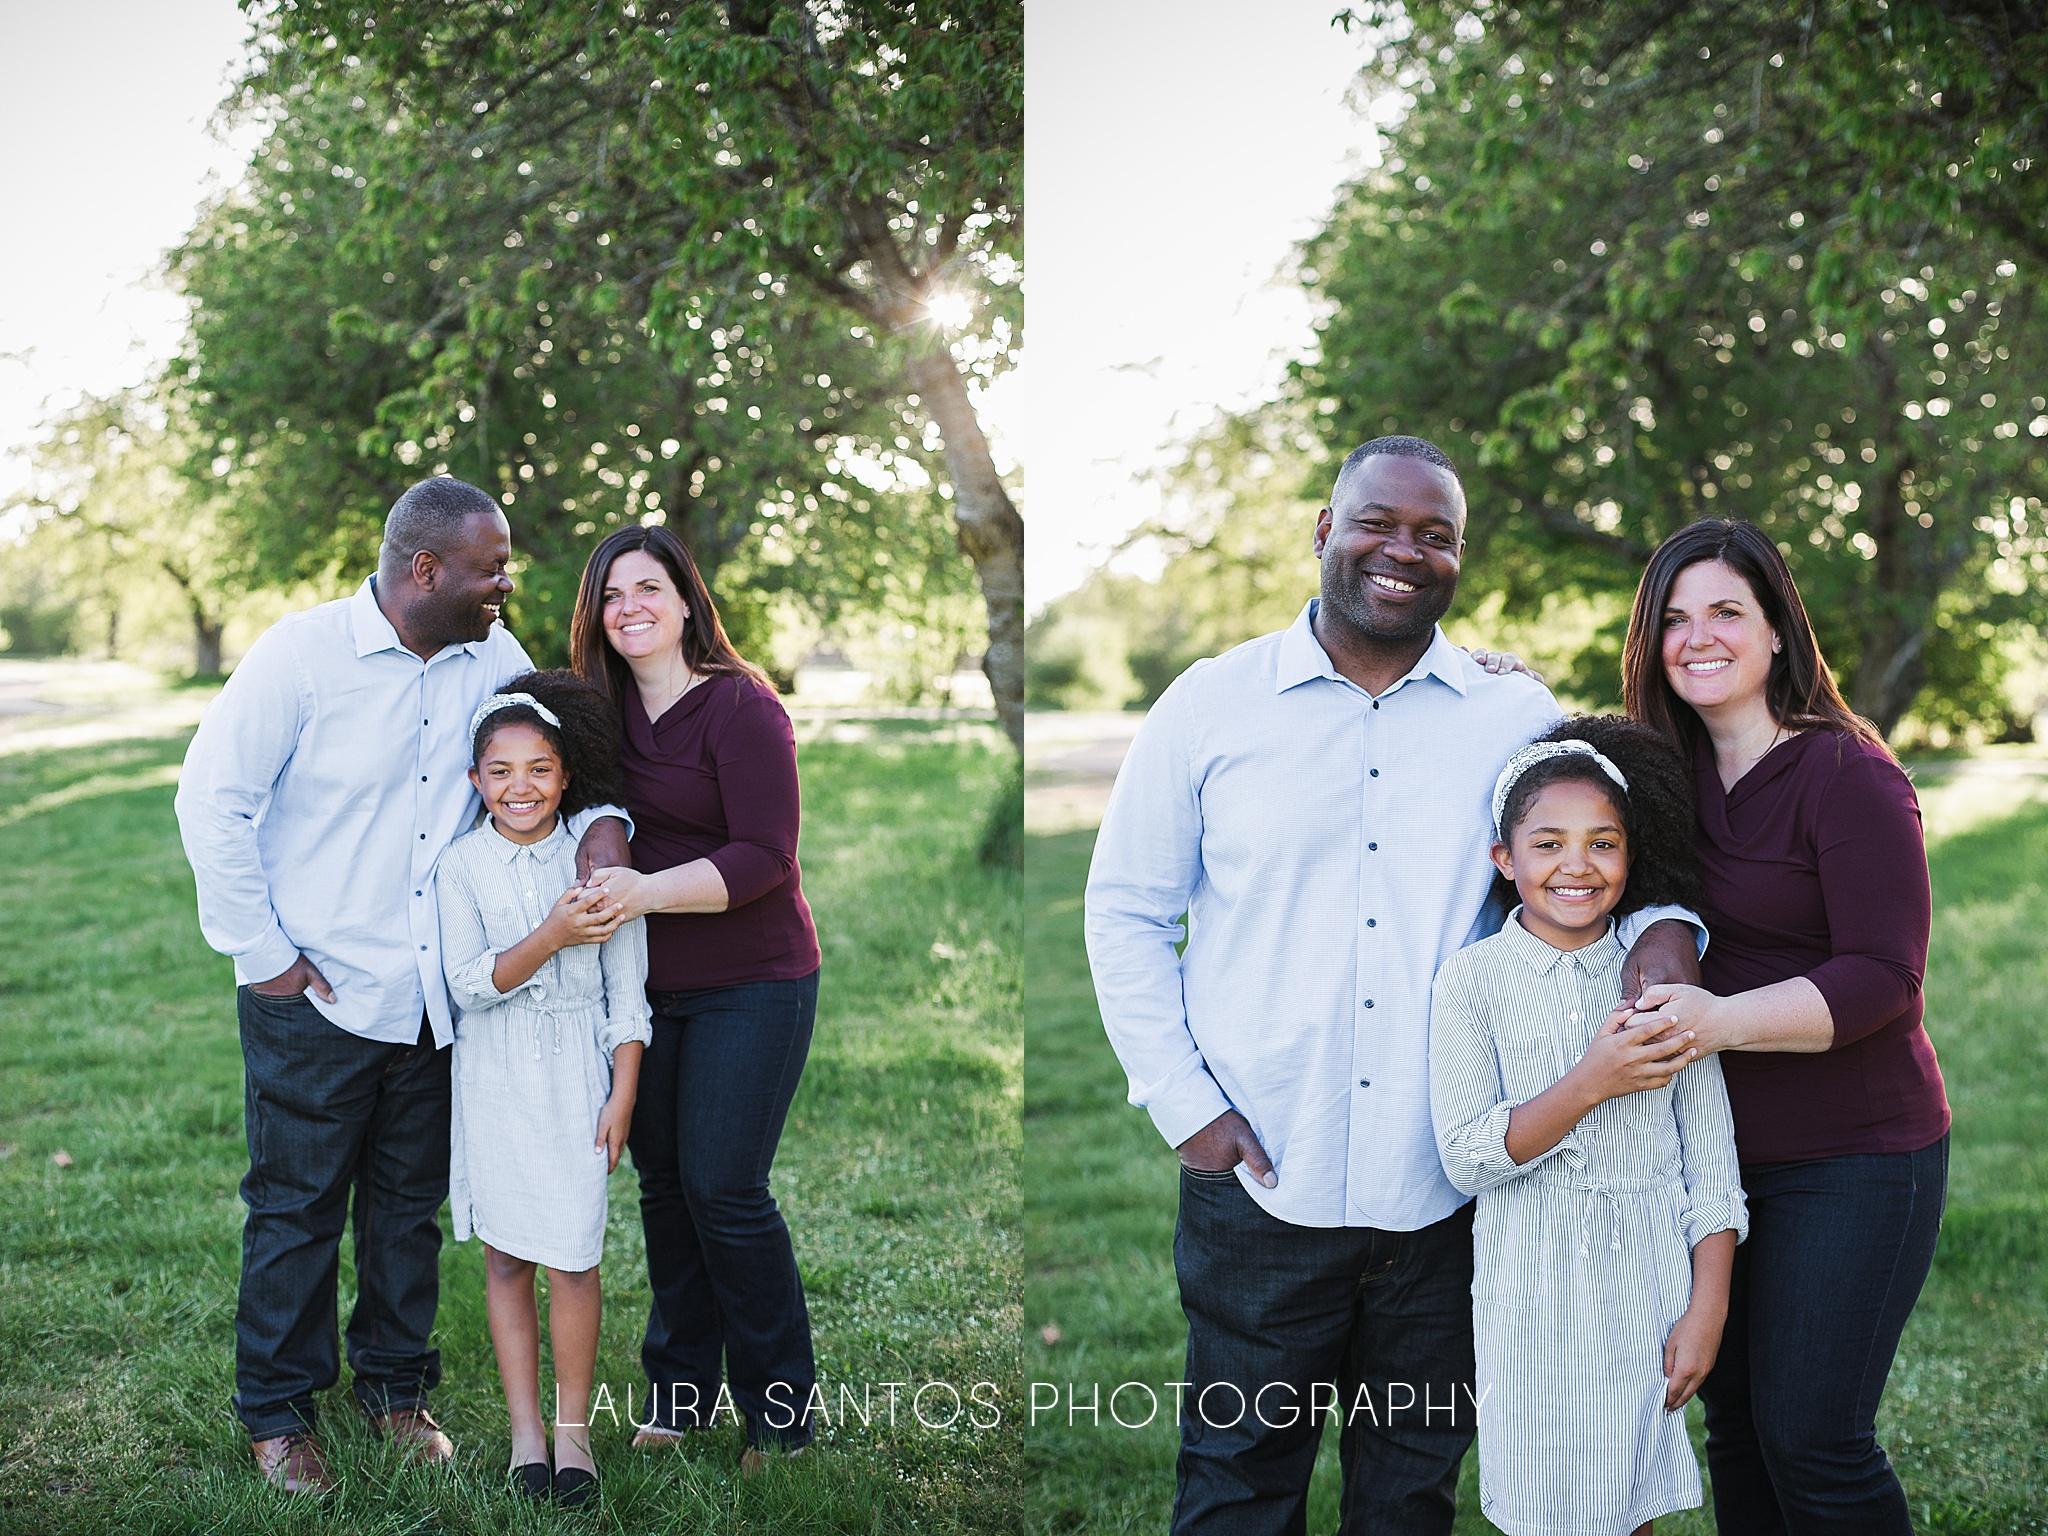 Laura Santos Photography Portland Oregon Family Photographer_0942.jpg